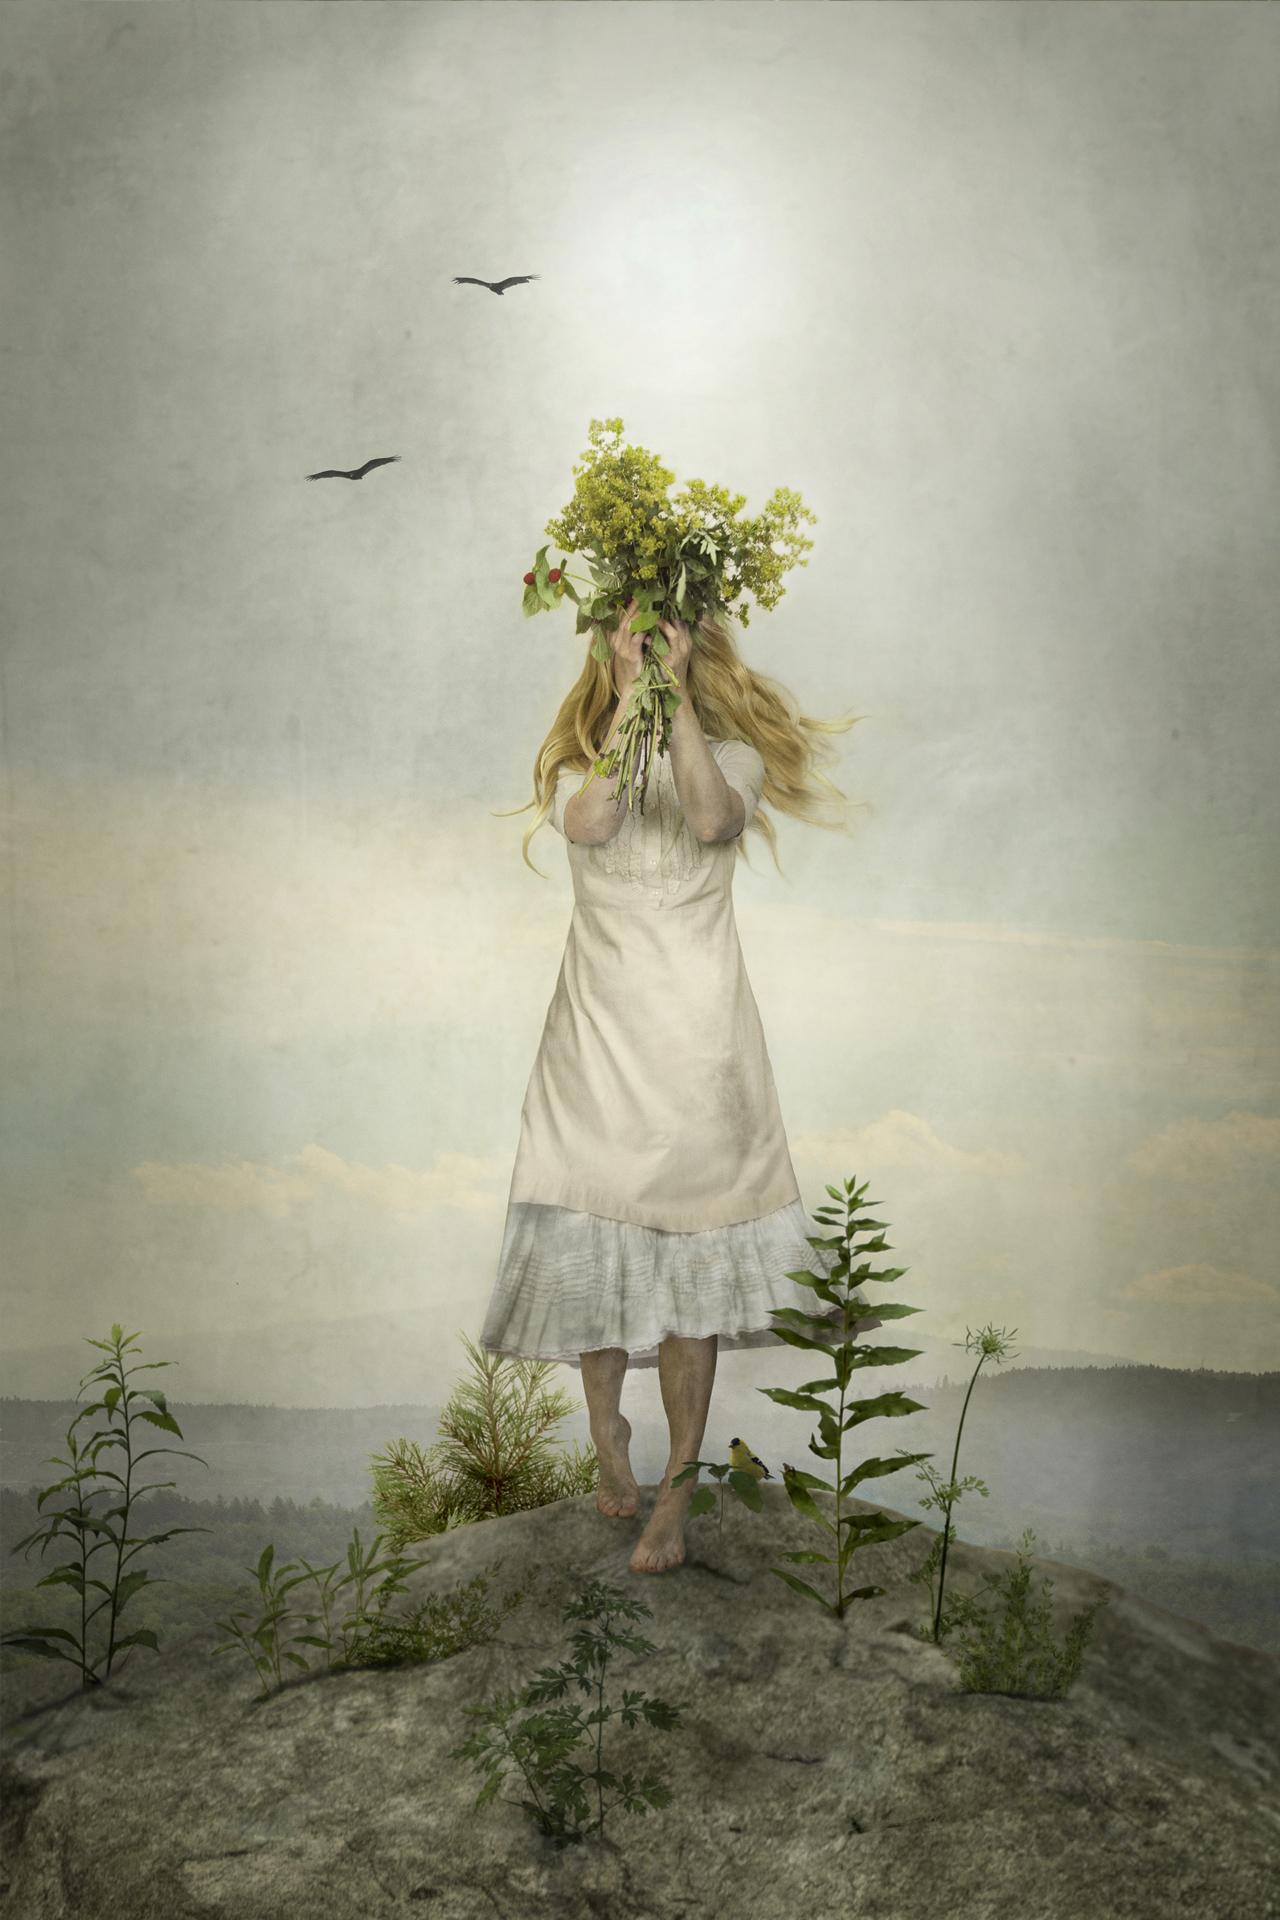 Elisabeth Ladwig, The Herbalist